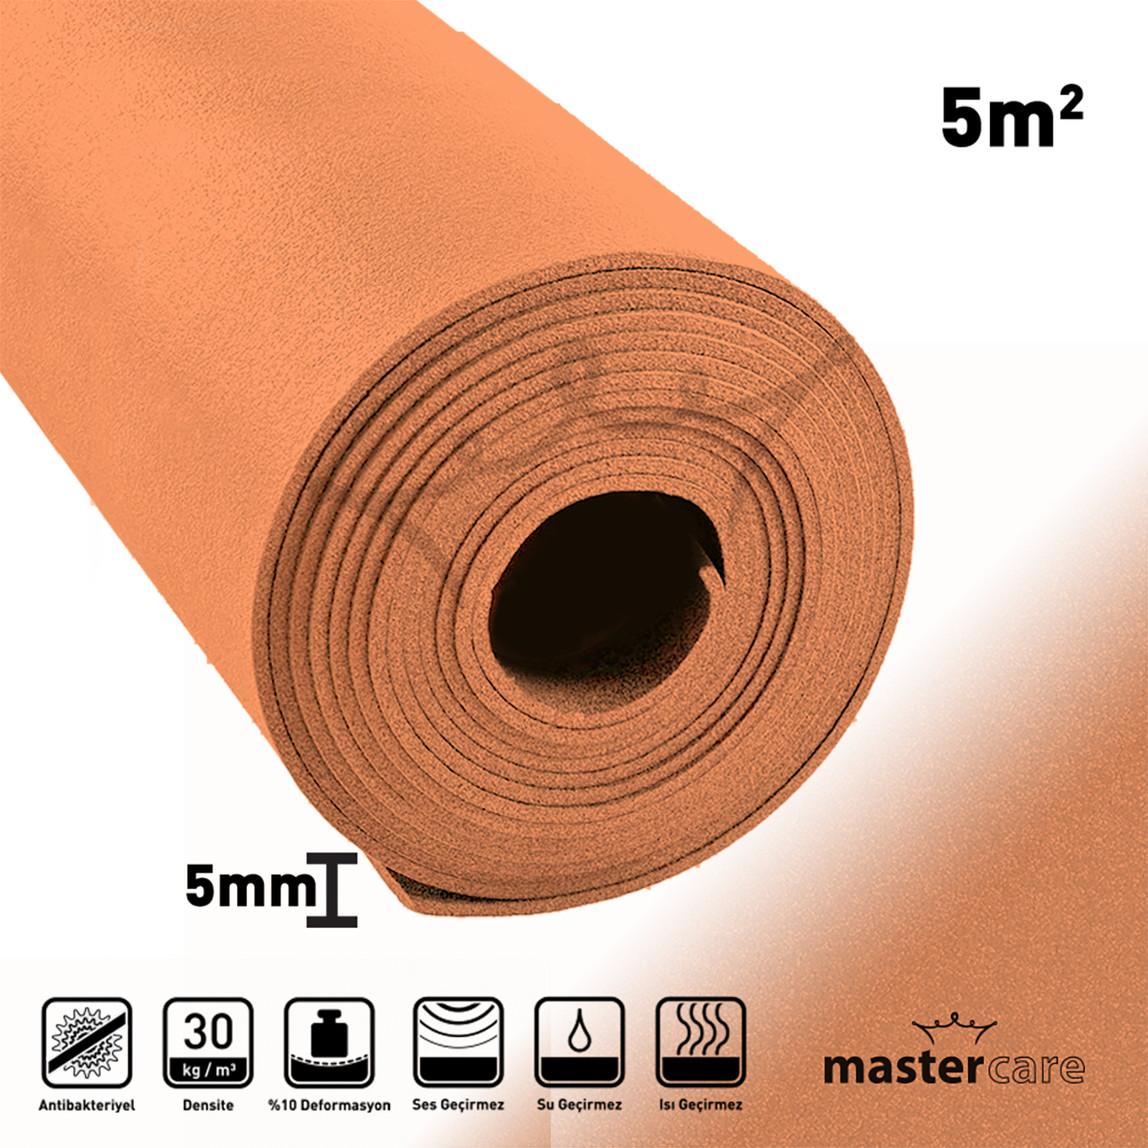 5mm Mastercare (5M2) Klasik Seri Ses Yalıtım Rulo.